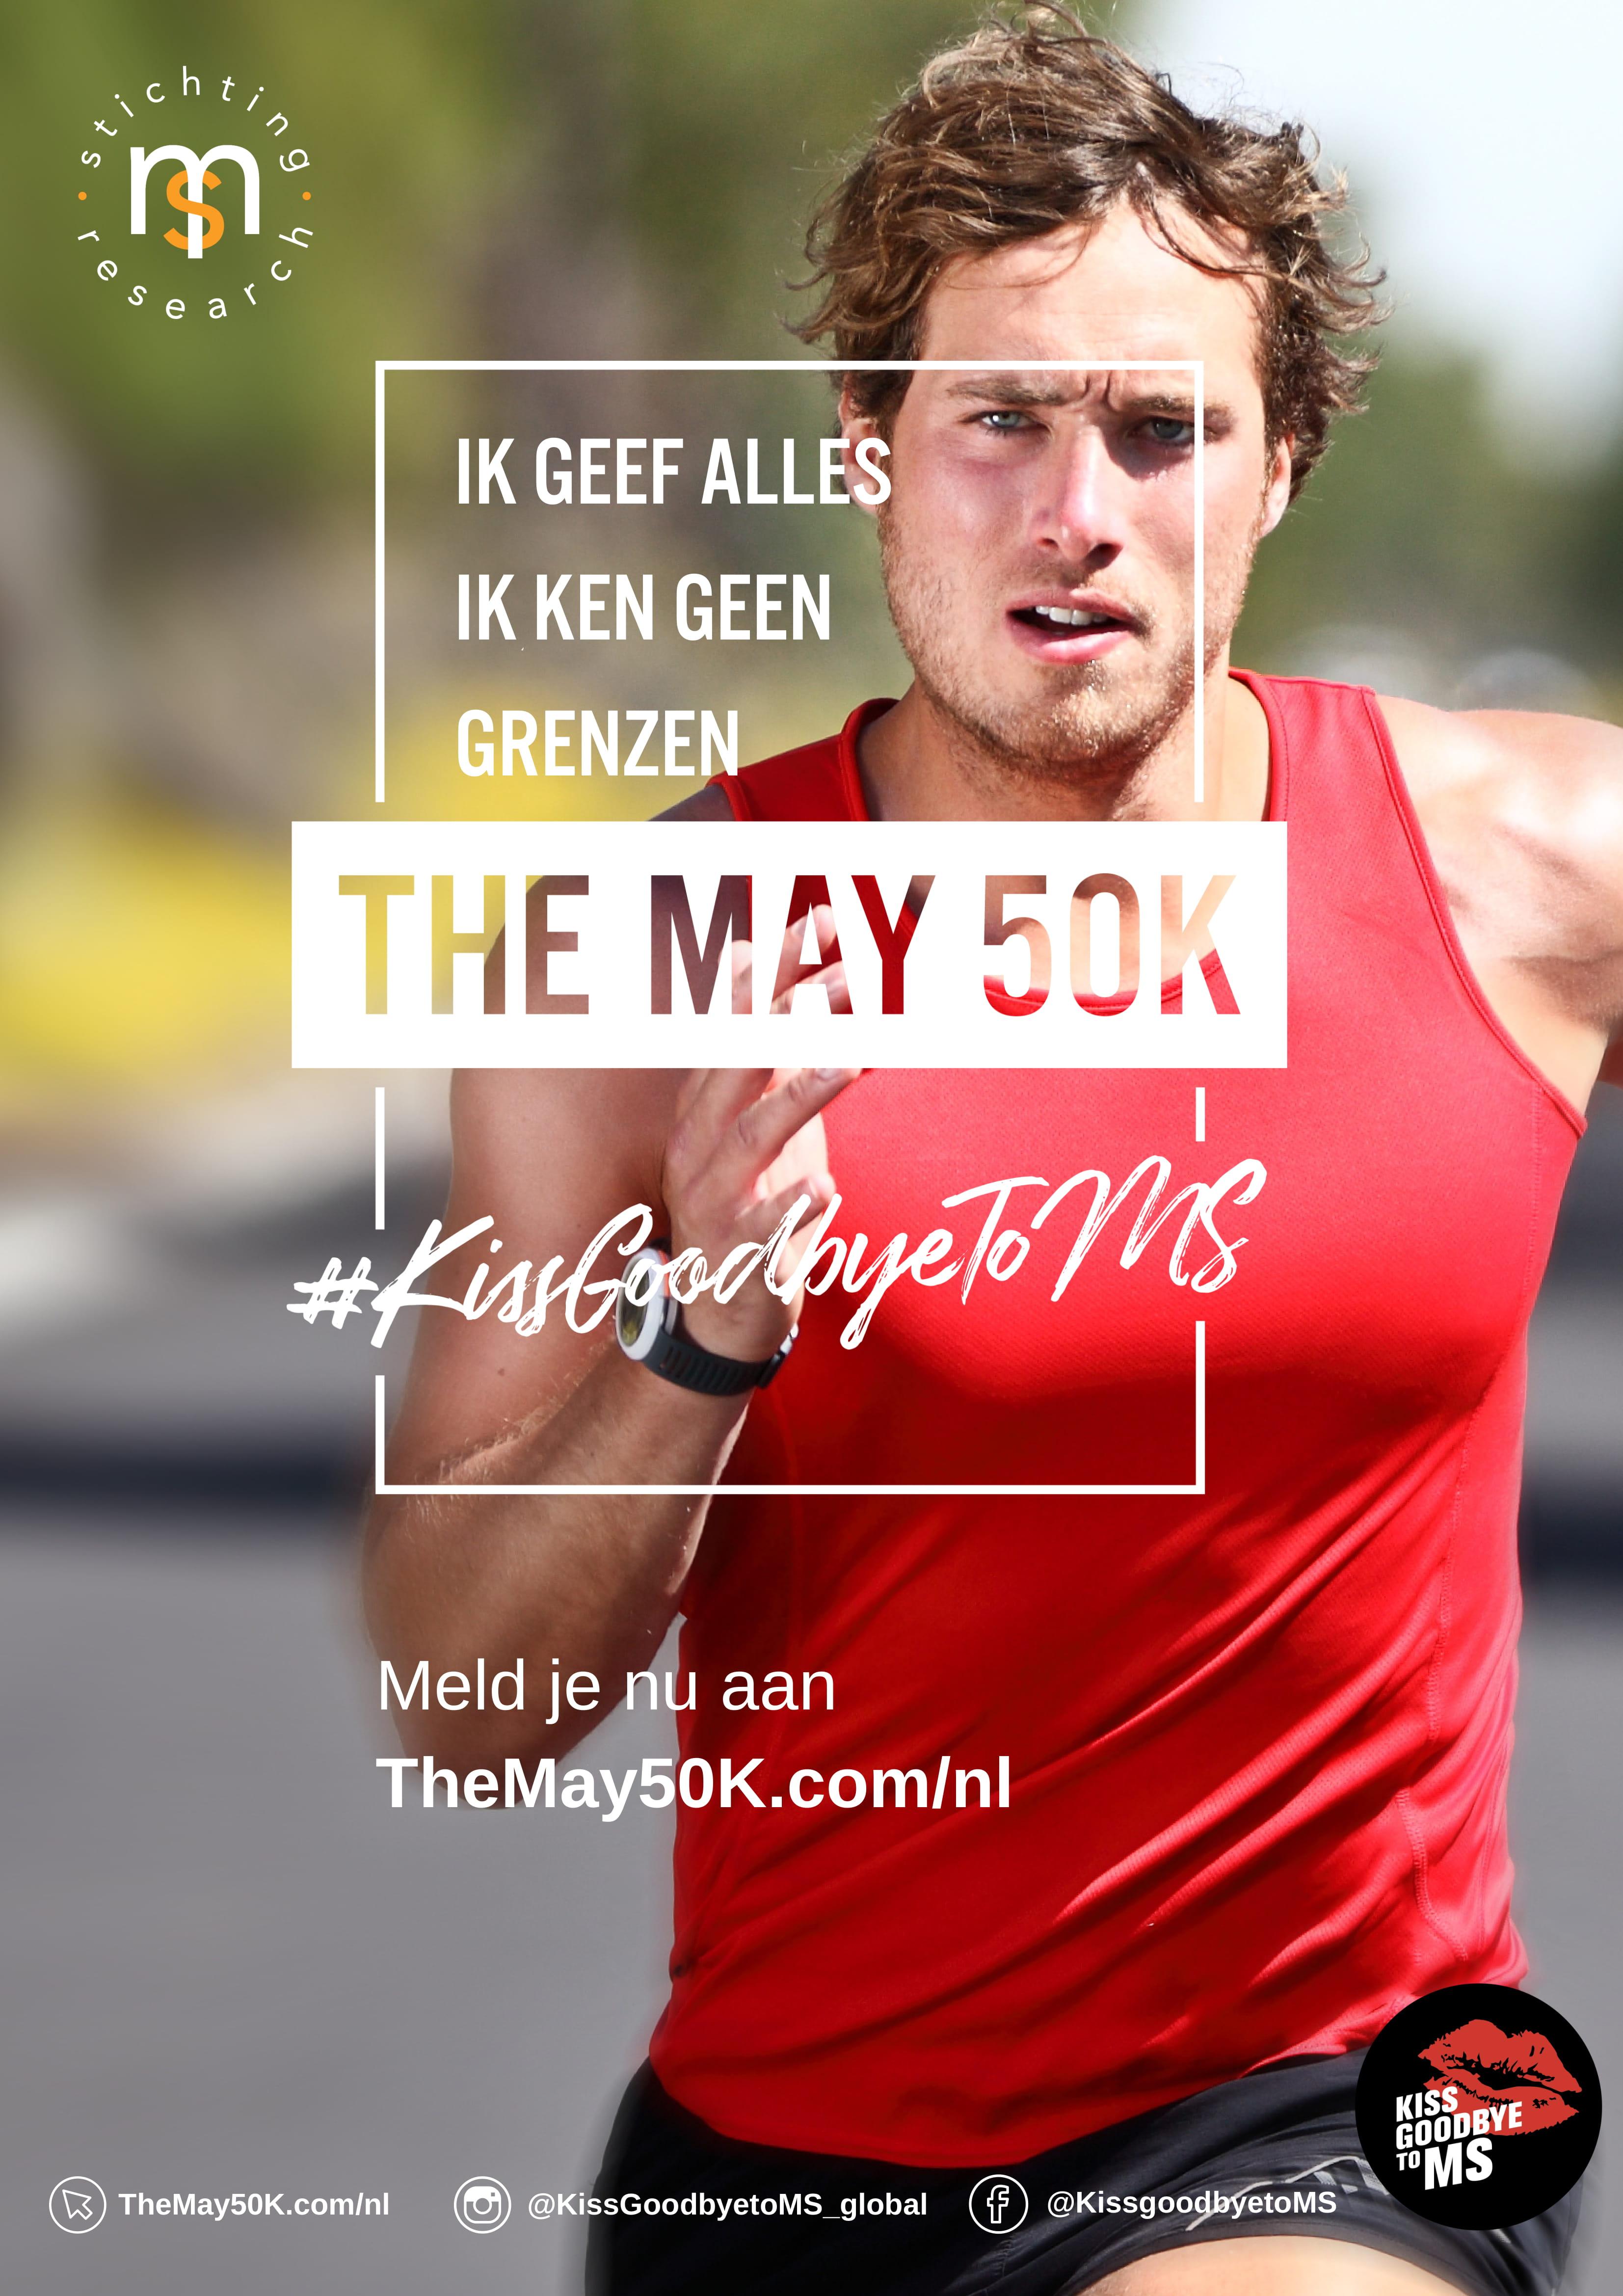 Netherlands Poster A2-Ik geef alles